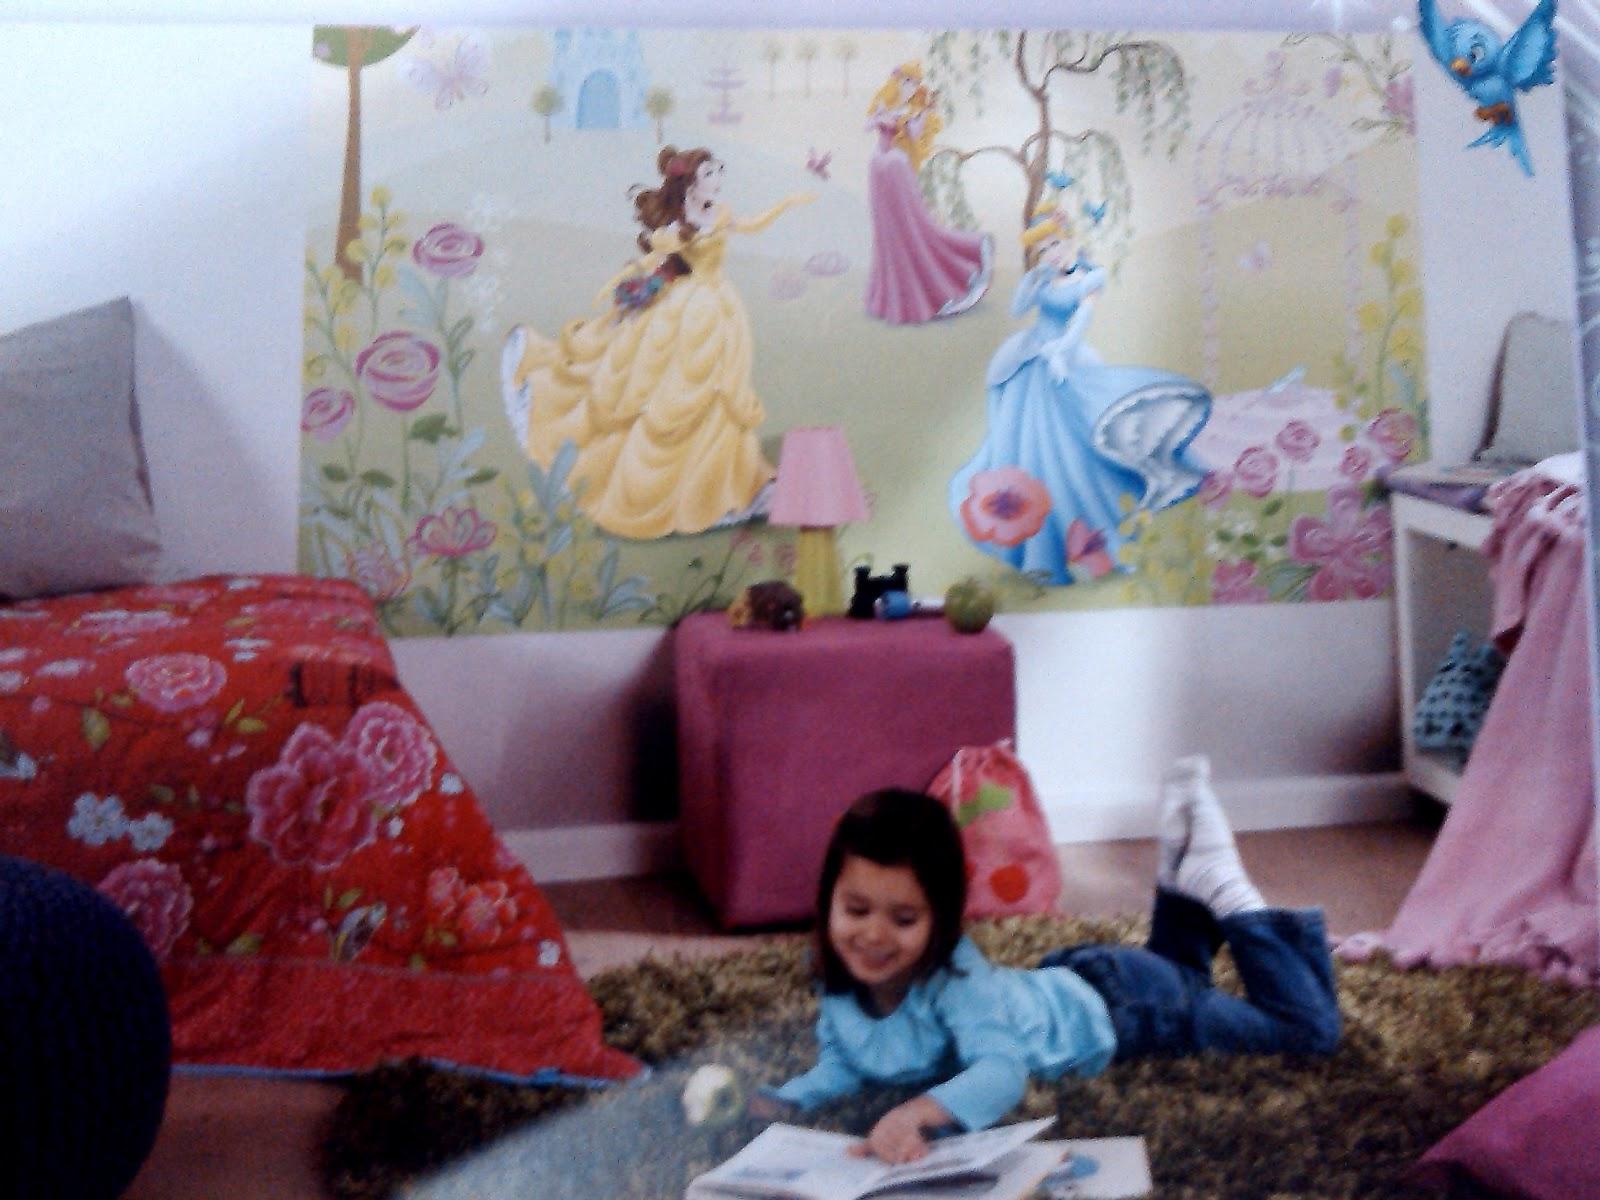 wallpaper loveshine creations mural untuk bilik kanak kanak